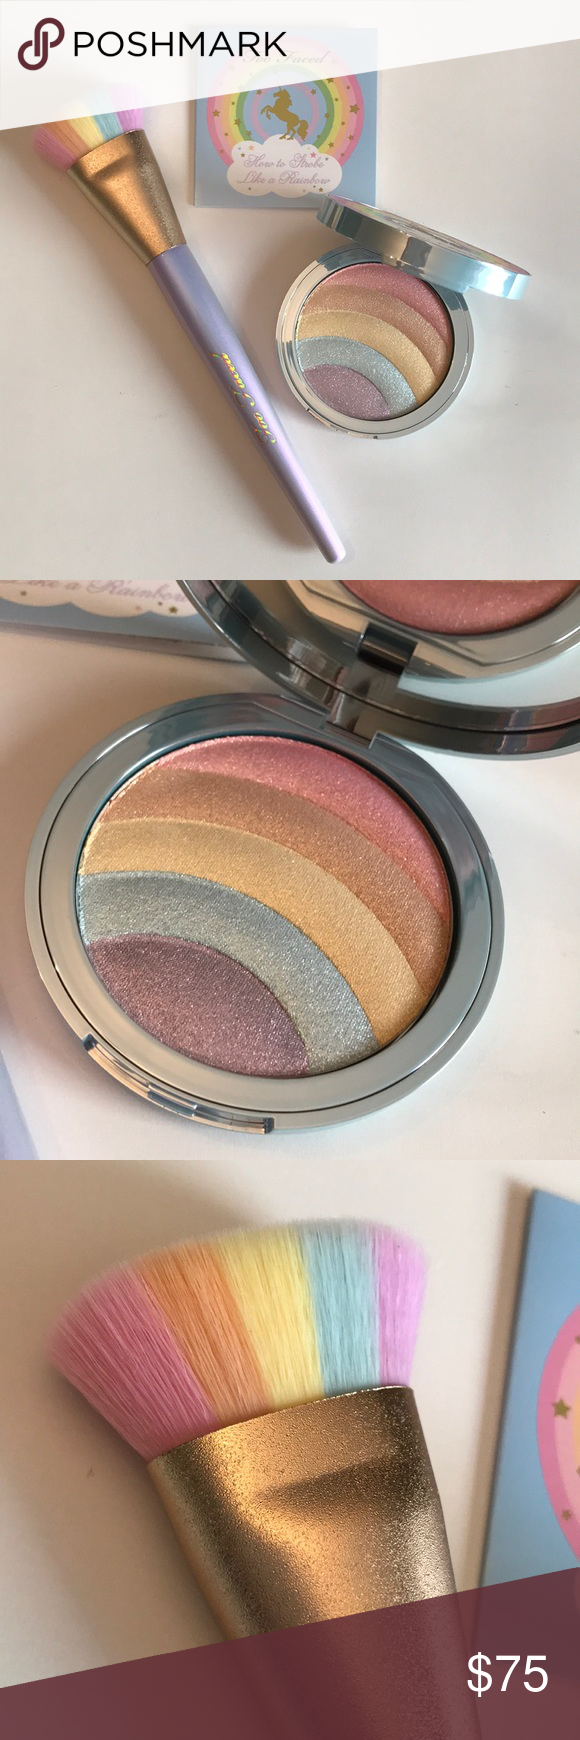 Too Faced Unicorn Rainbow Highlighter Brush Set NWT